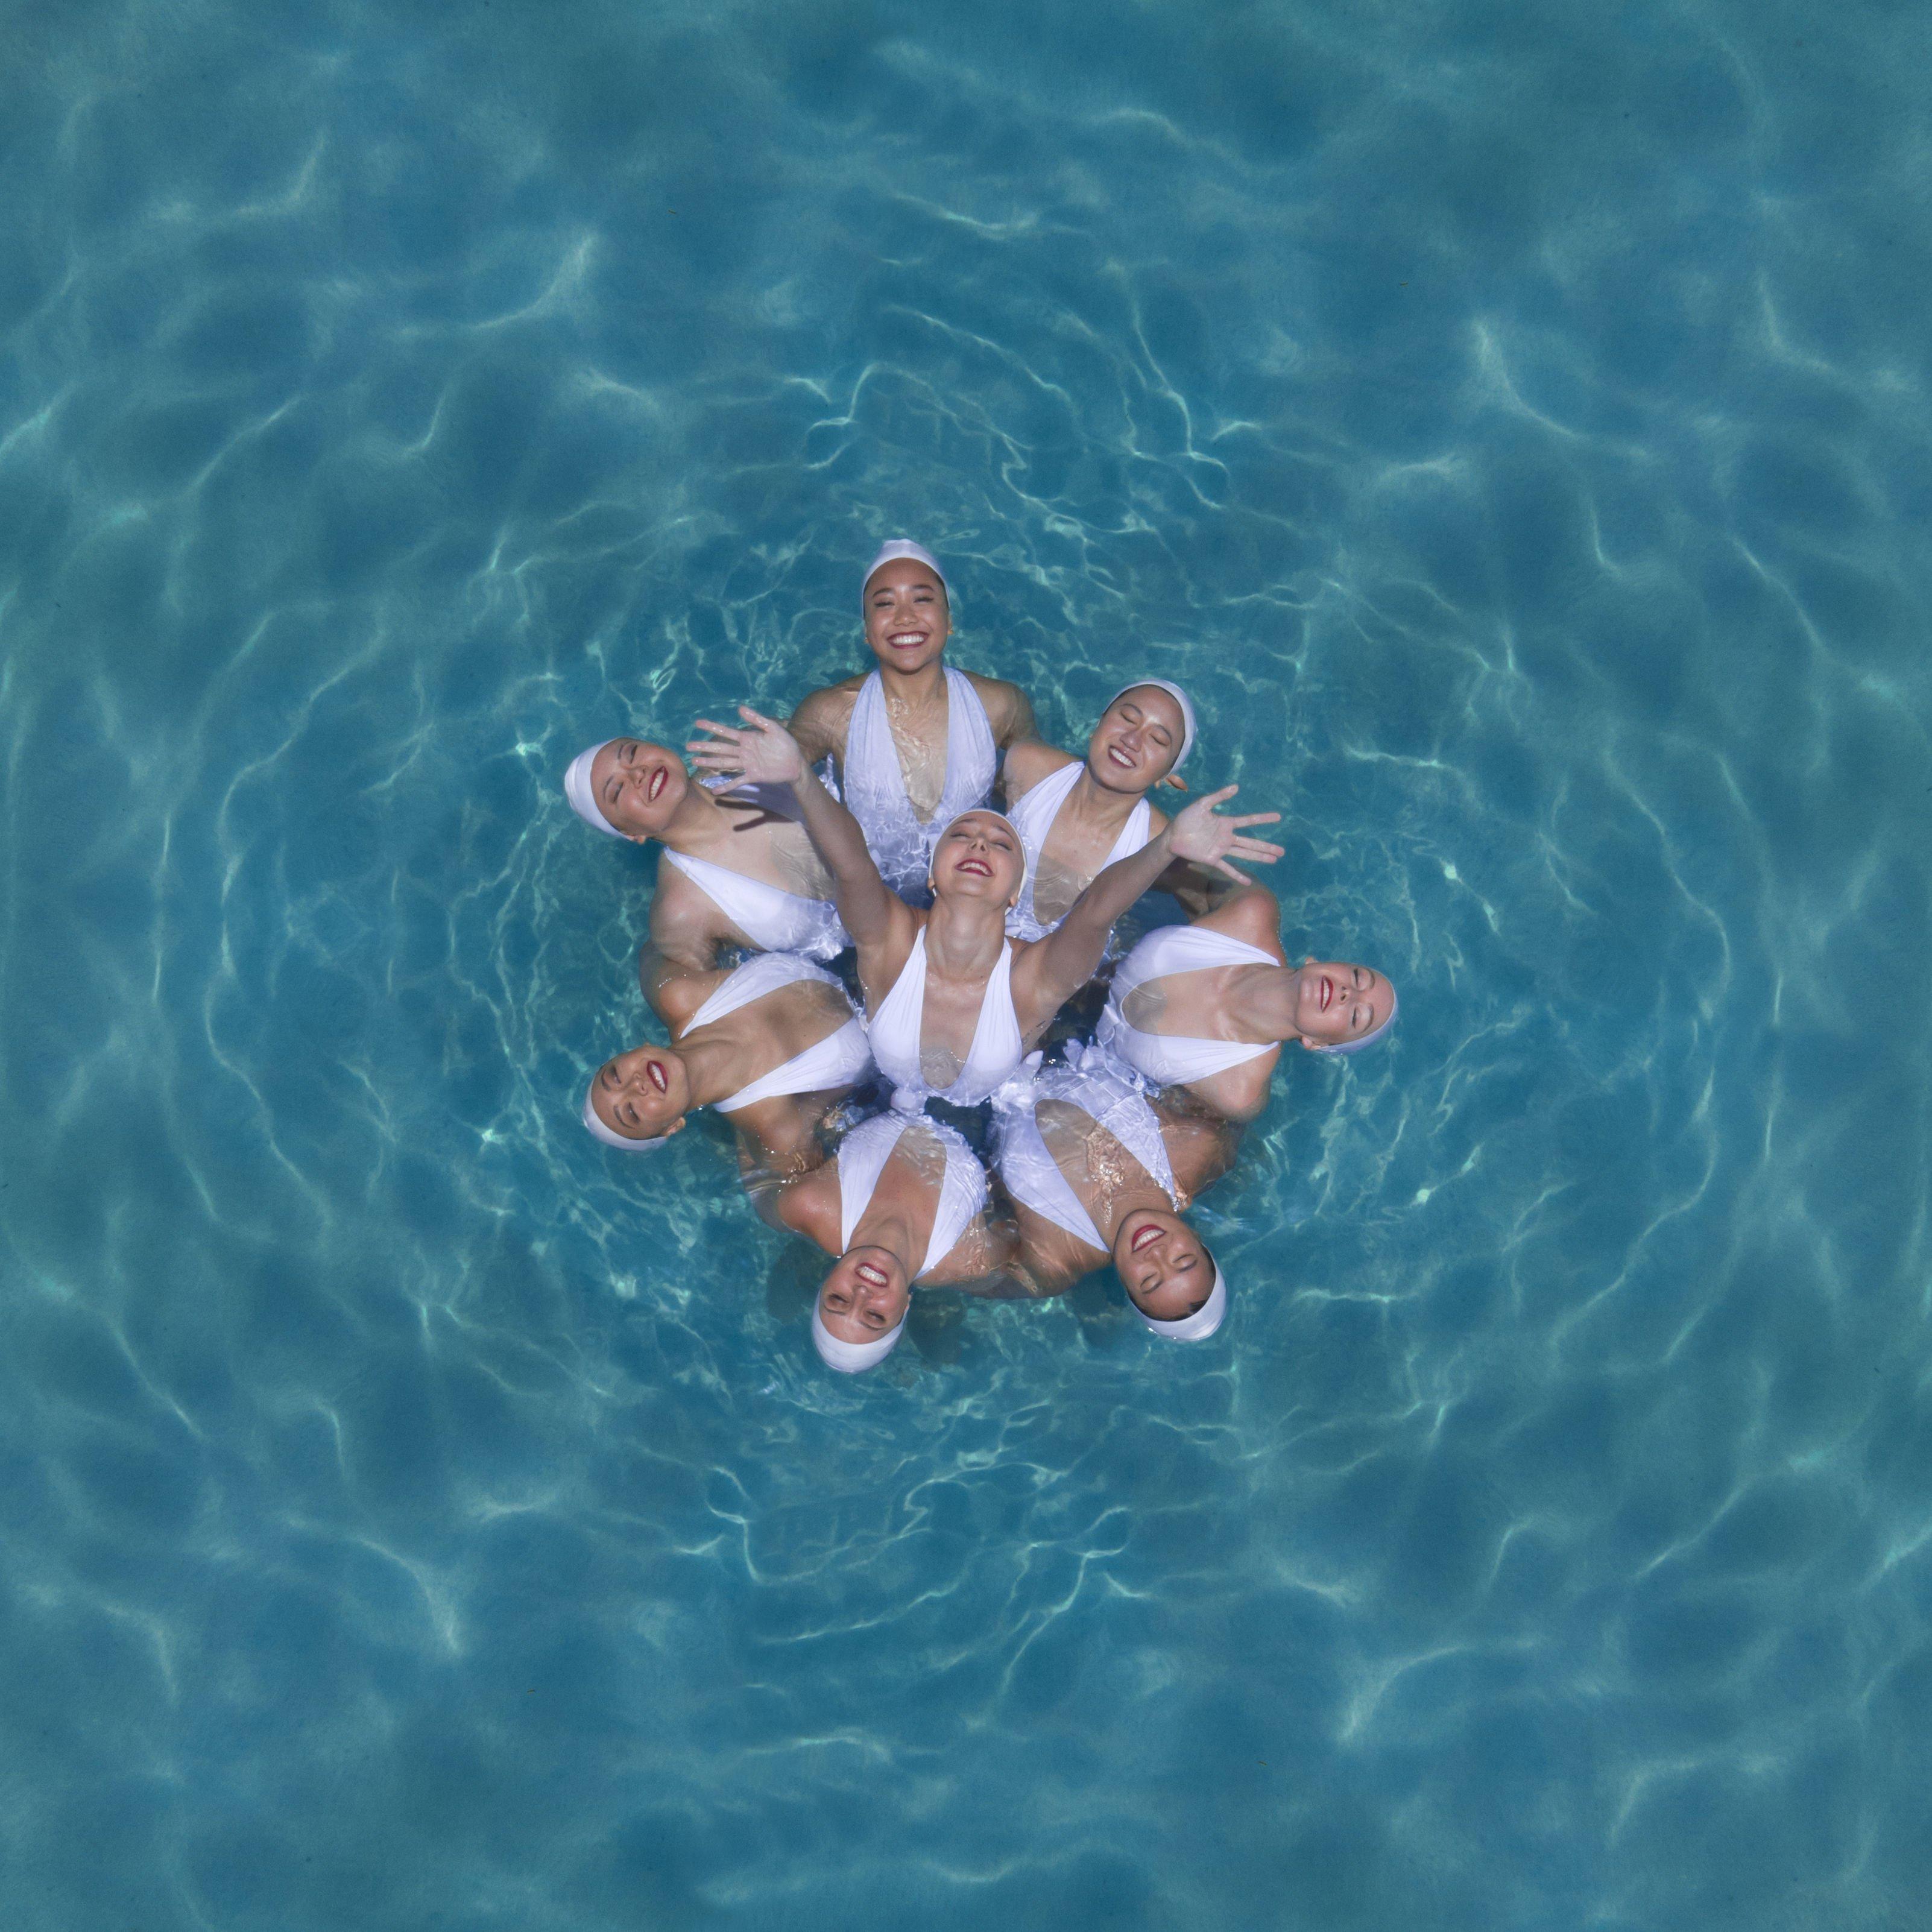 Synchronized Swimming - Brad Walls